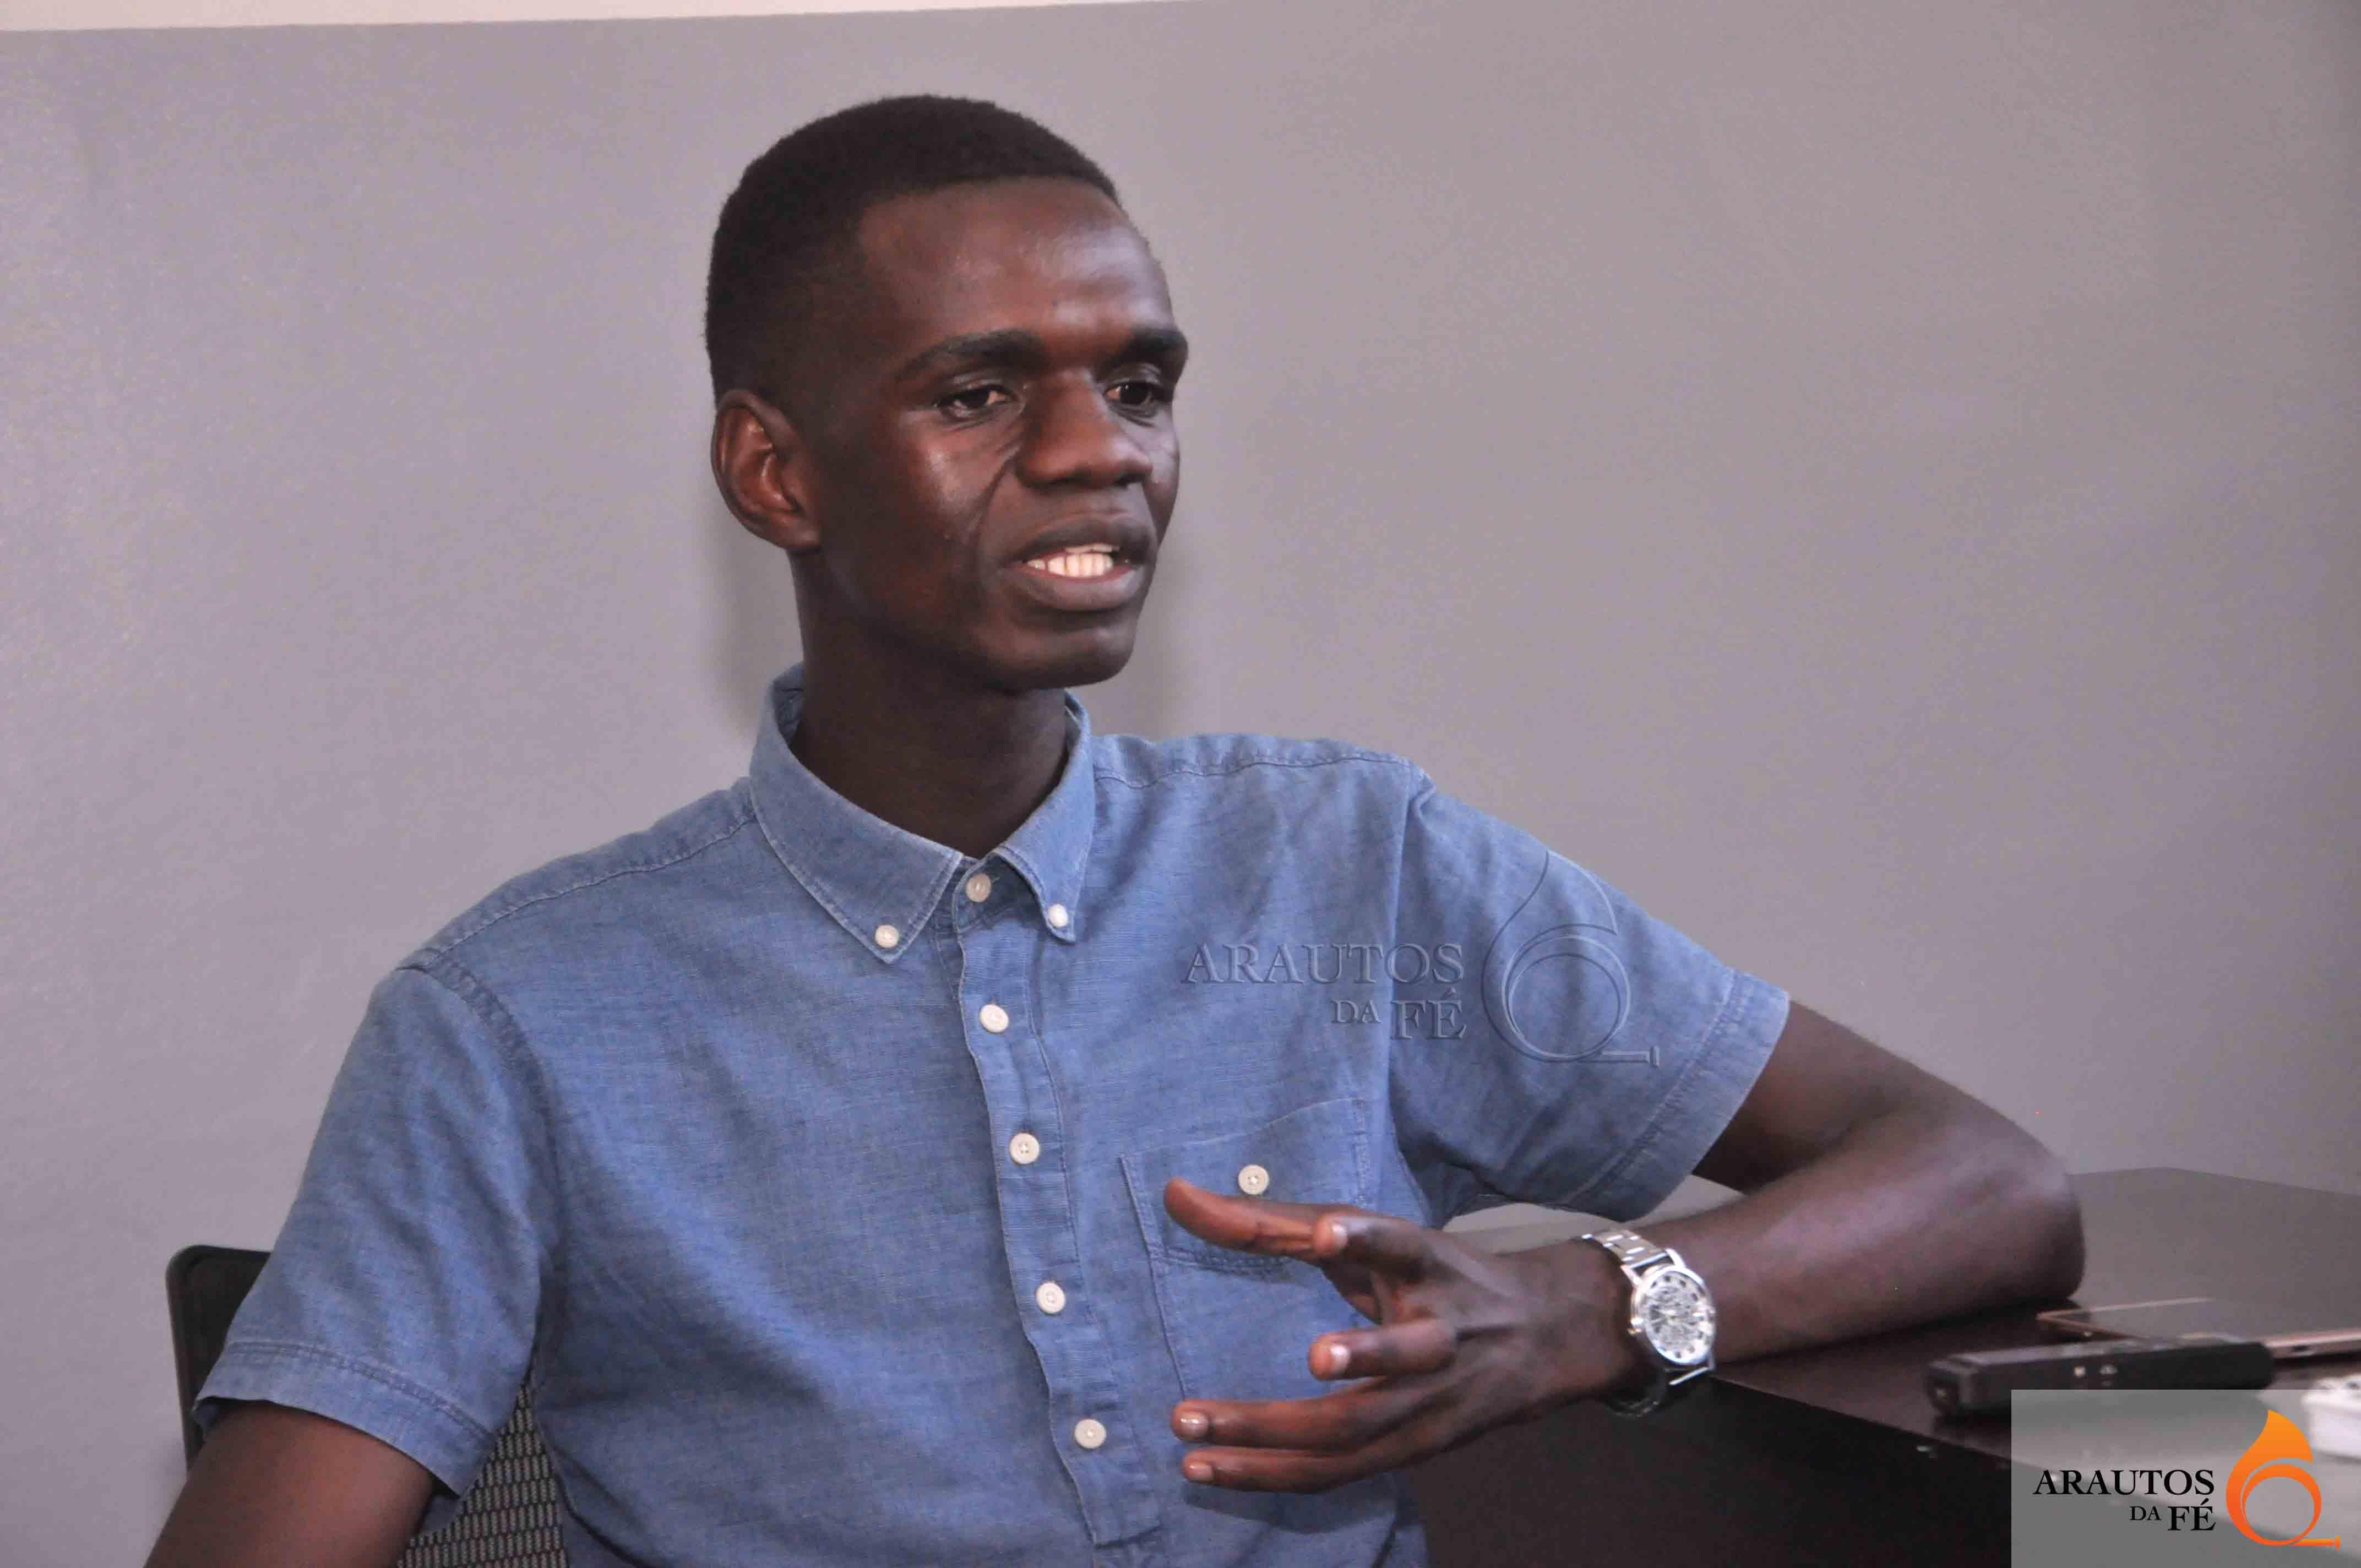 Psicologo clínico Fernando Kawendimba. (Foto: Jaime Chiquito)